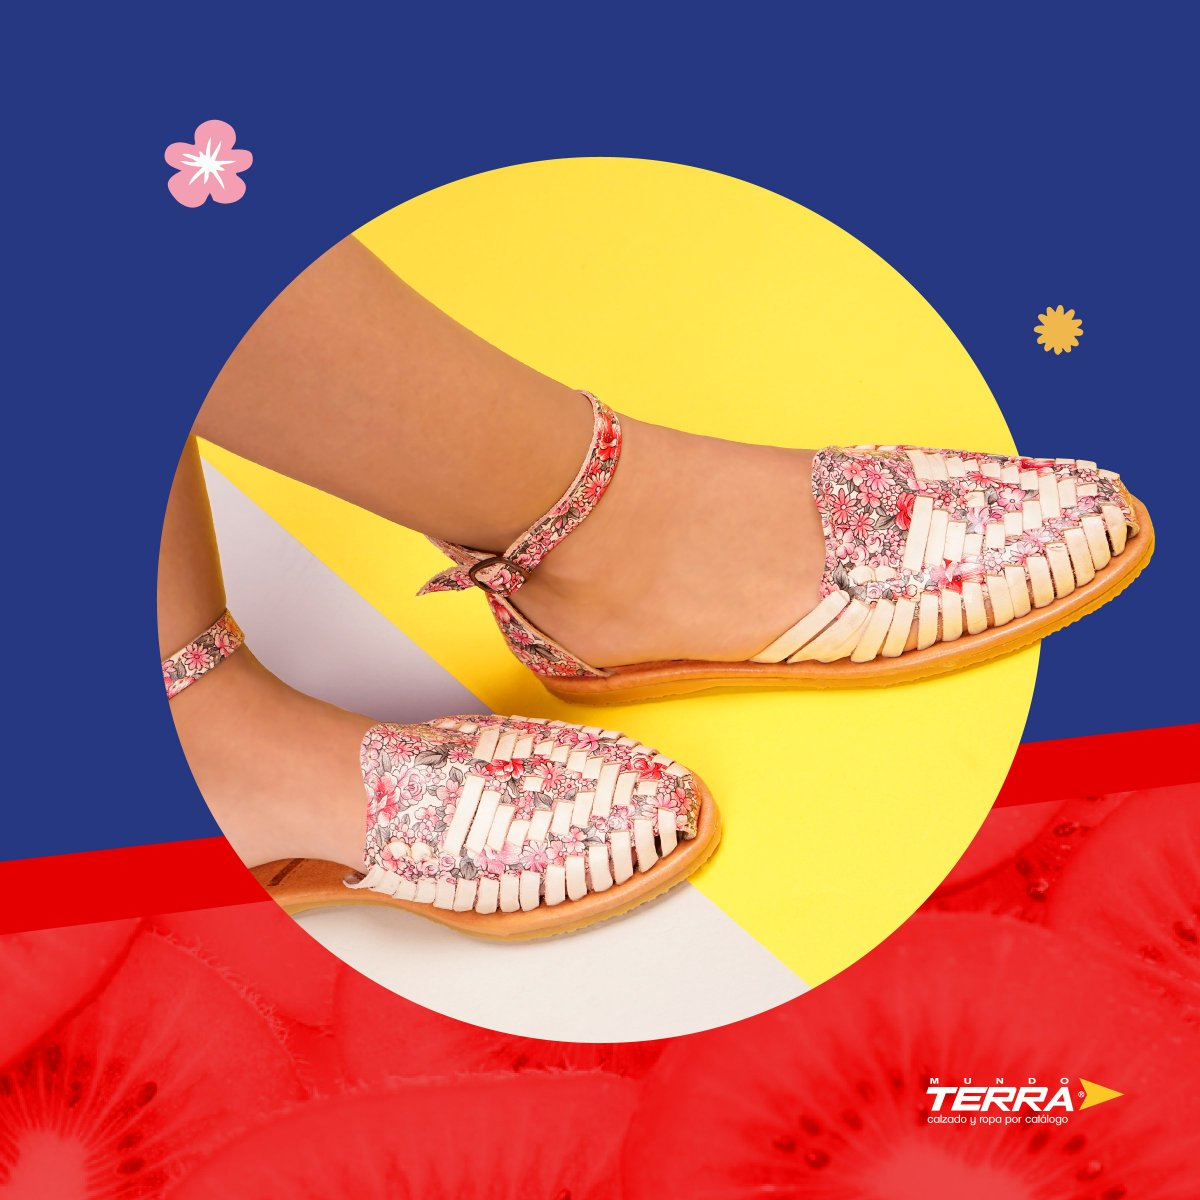 La temporada de flores llegó a nuestros zapatos más frescos.   #mundoterra #shoes #loveshoes #primavera #loveit #ropa #zapatos https://t.co/1bWZunVLsZ